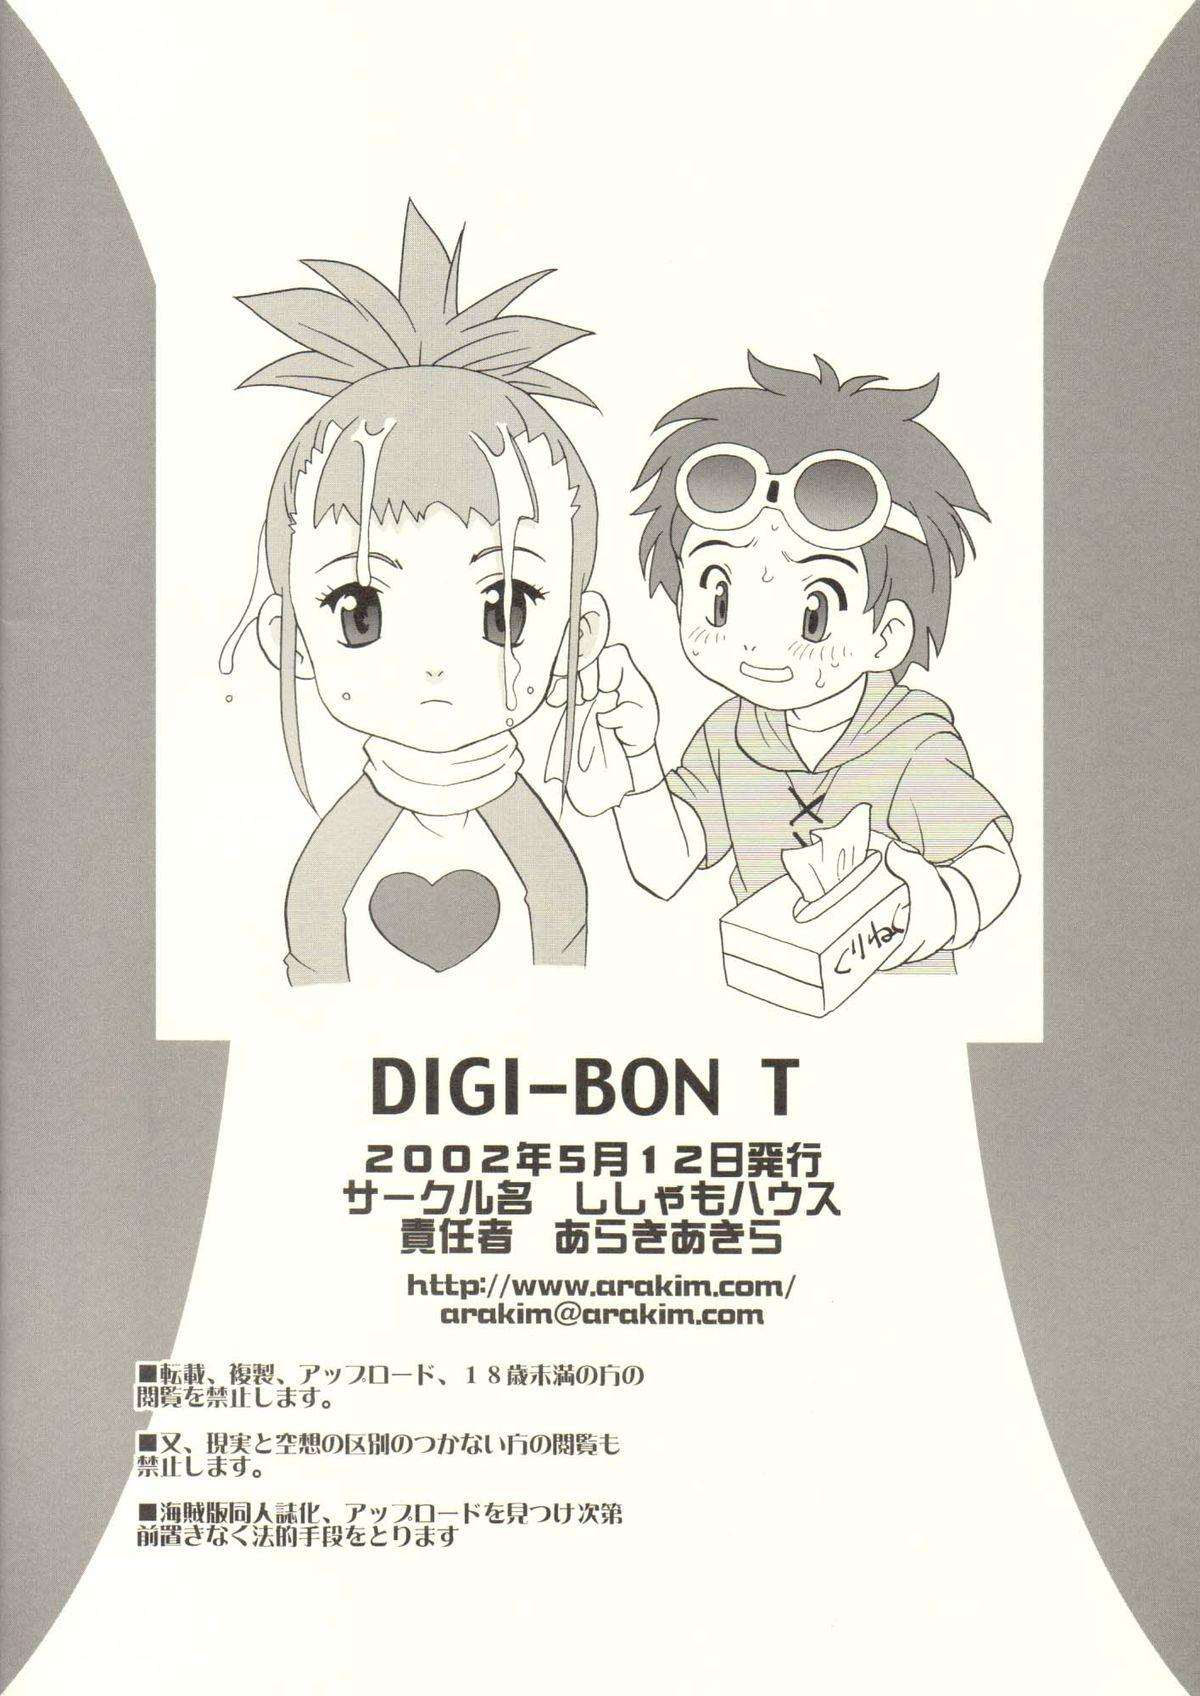 Digibon T 19